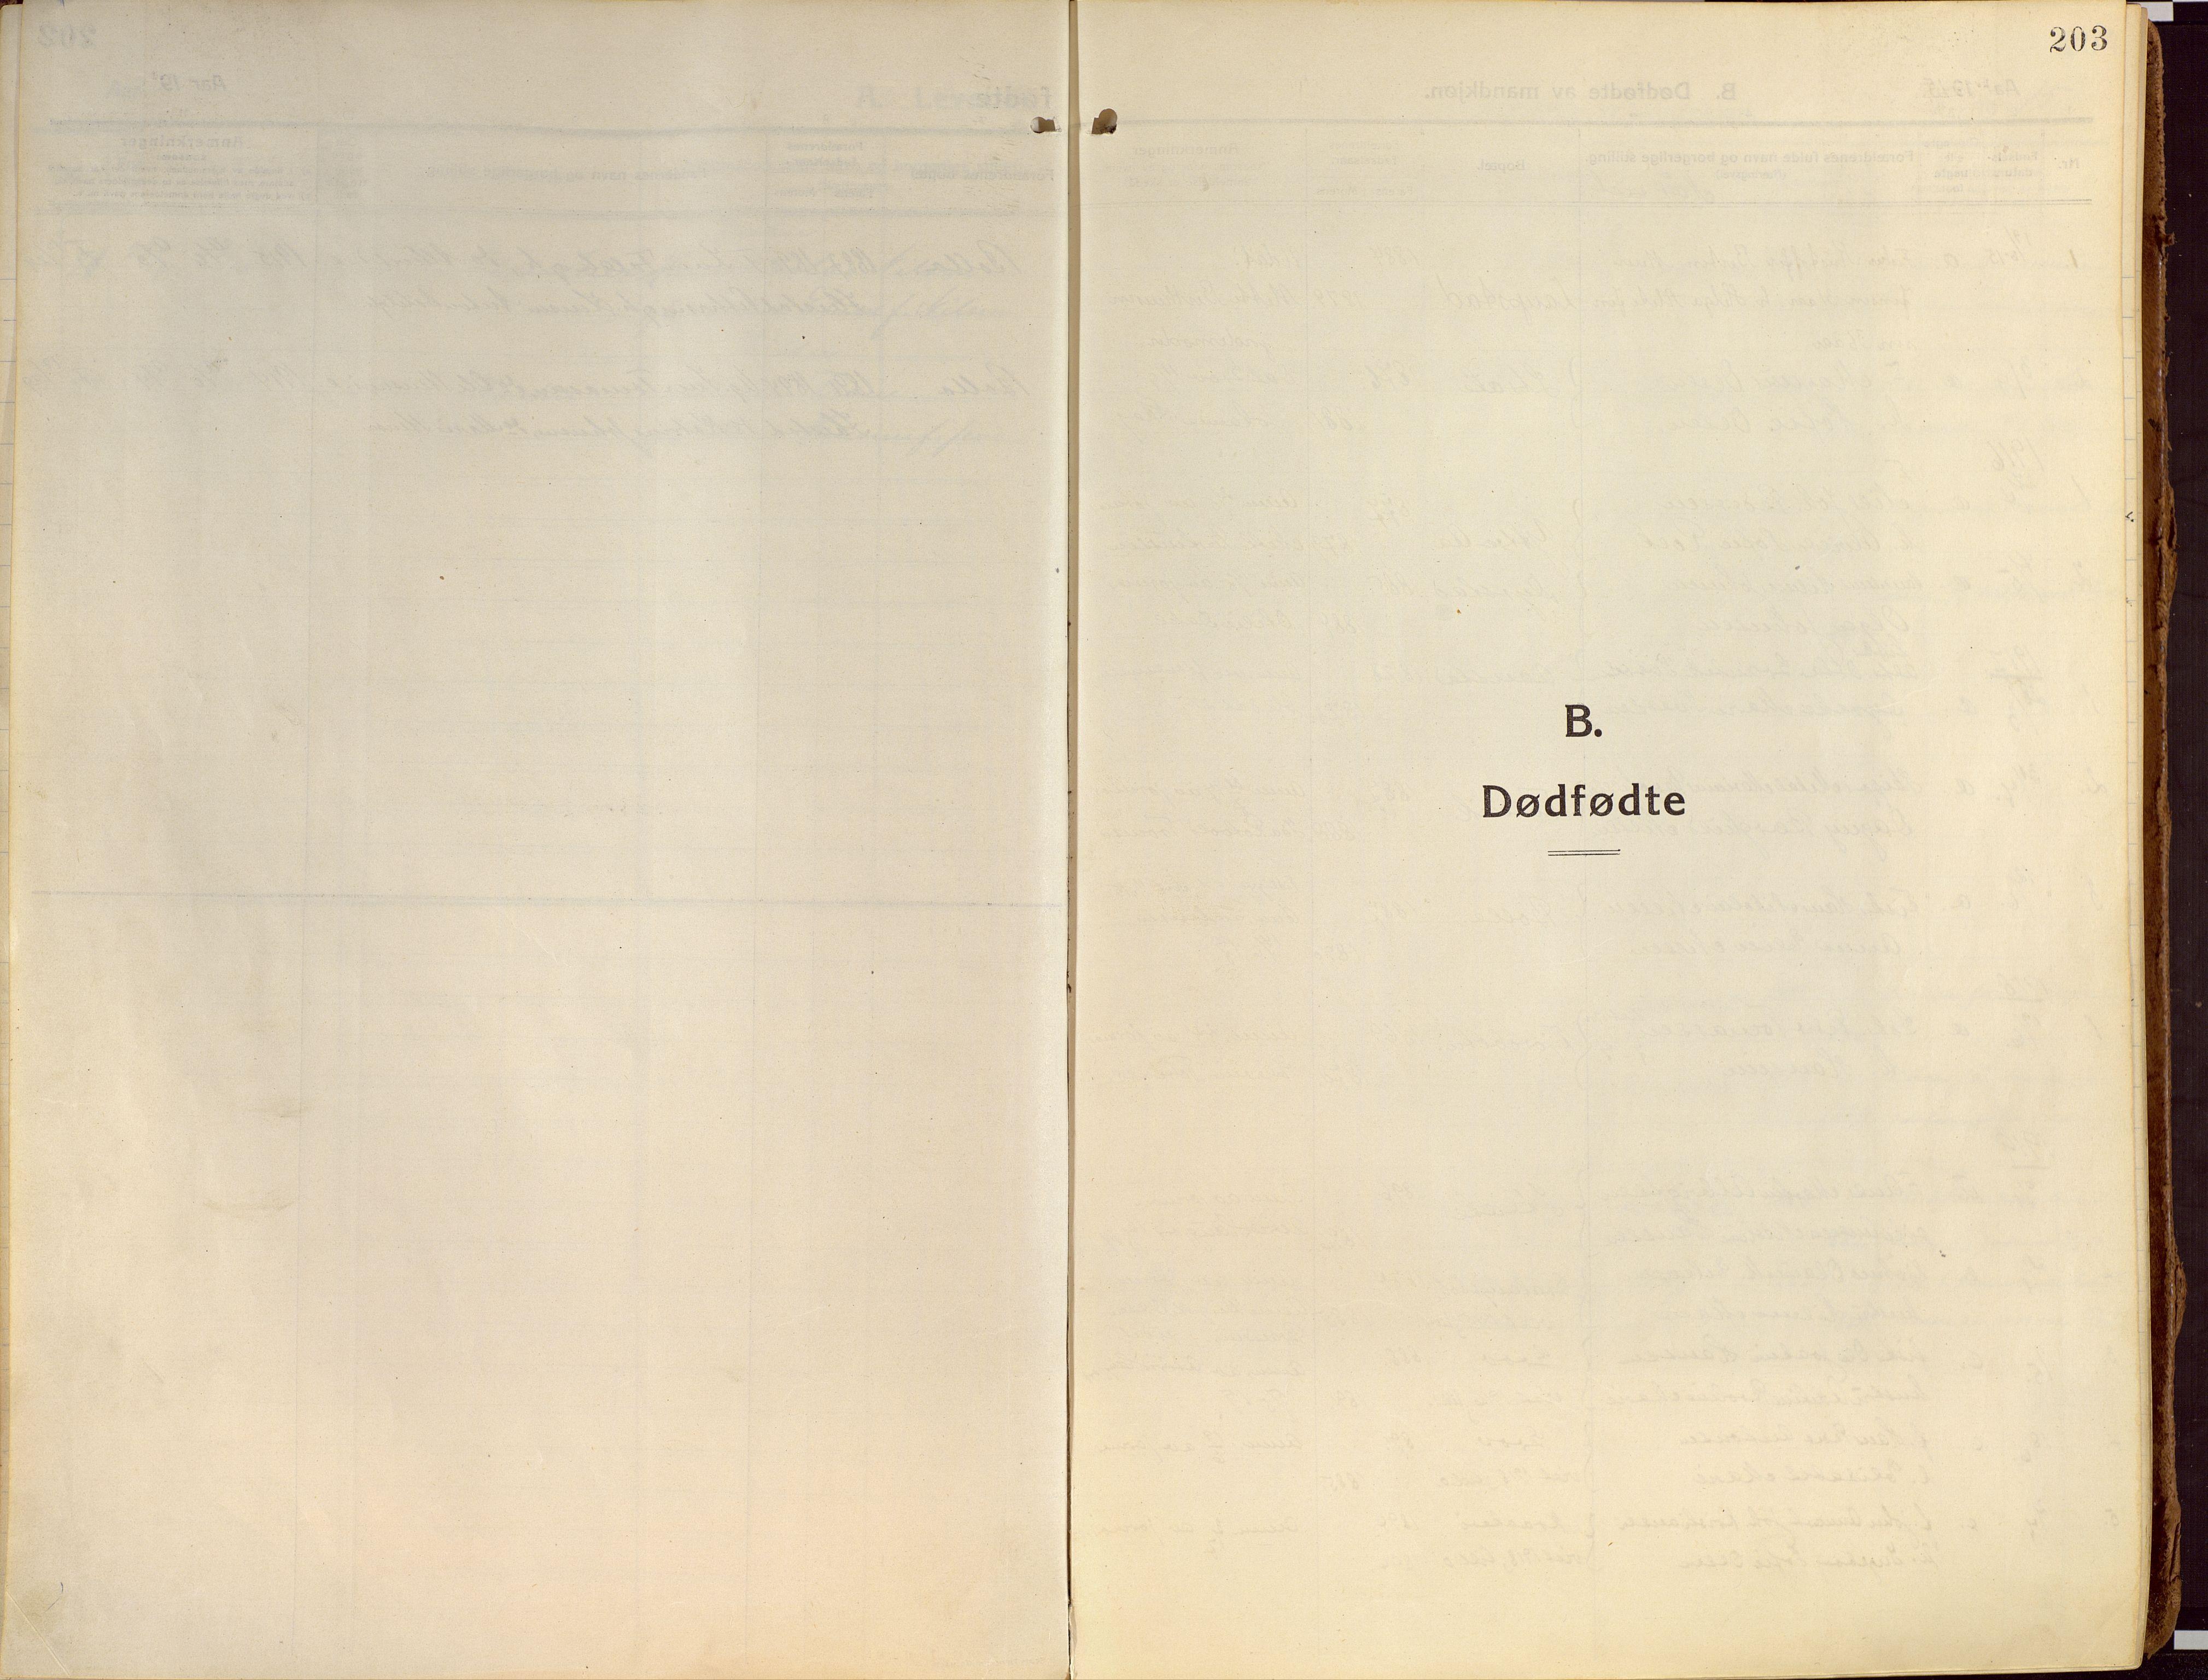 SATØ, Ibestad sokneprestembete, Ministerialbok nr. 18, 1915-1929, s. 203